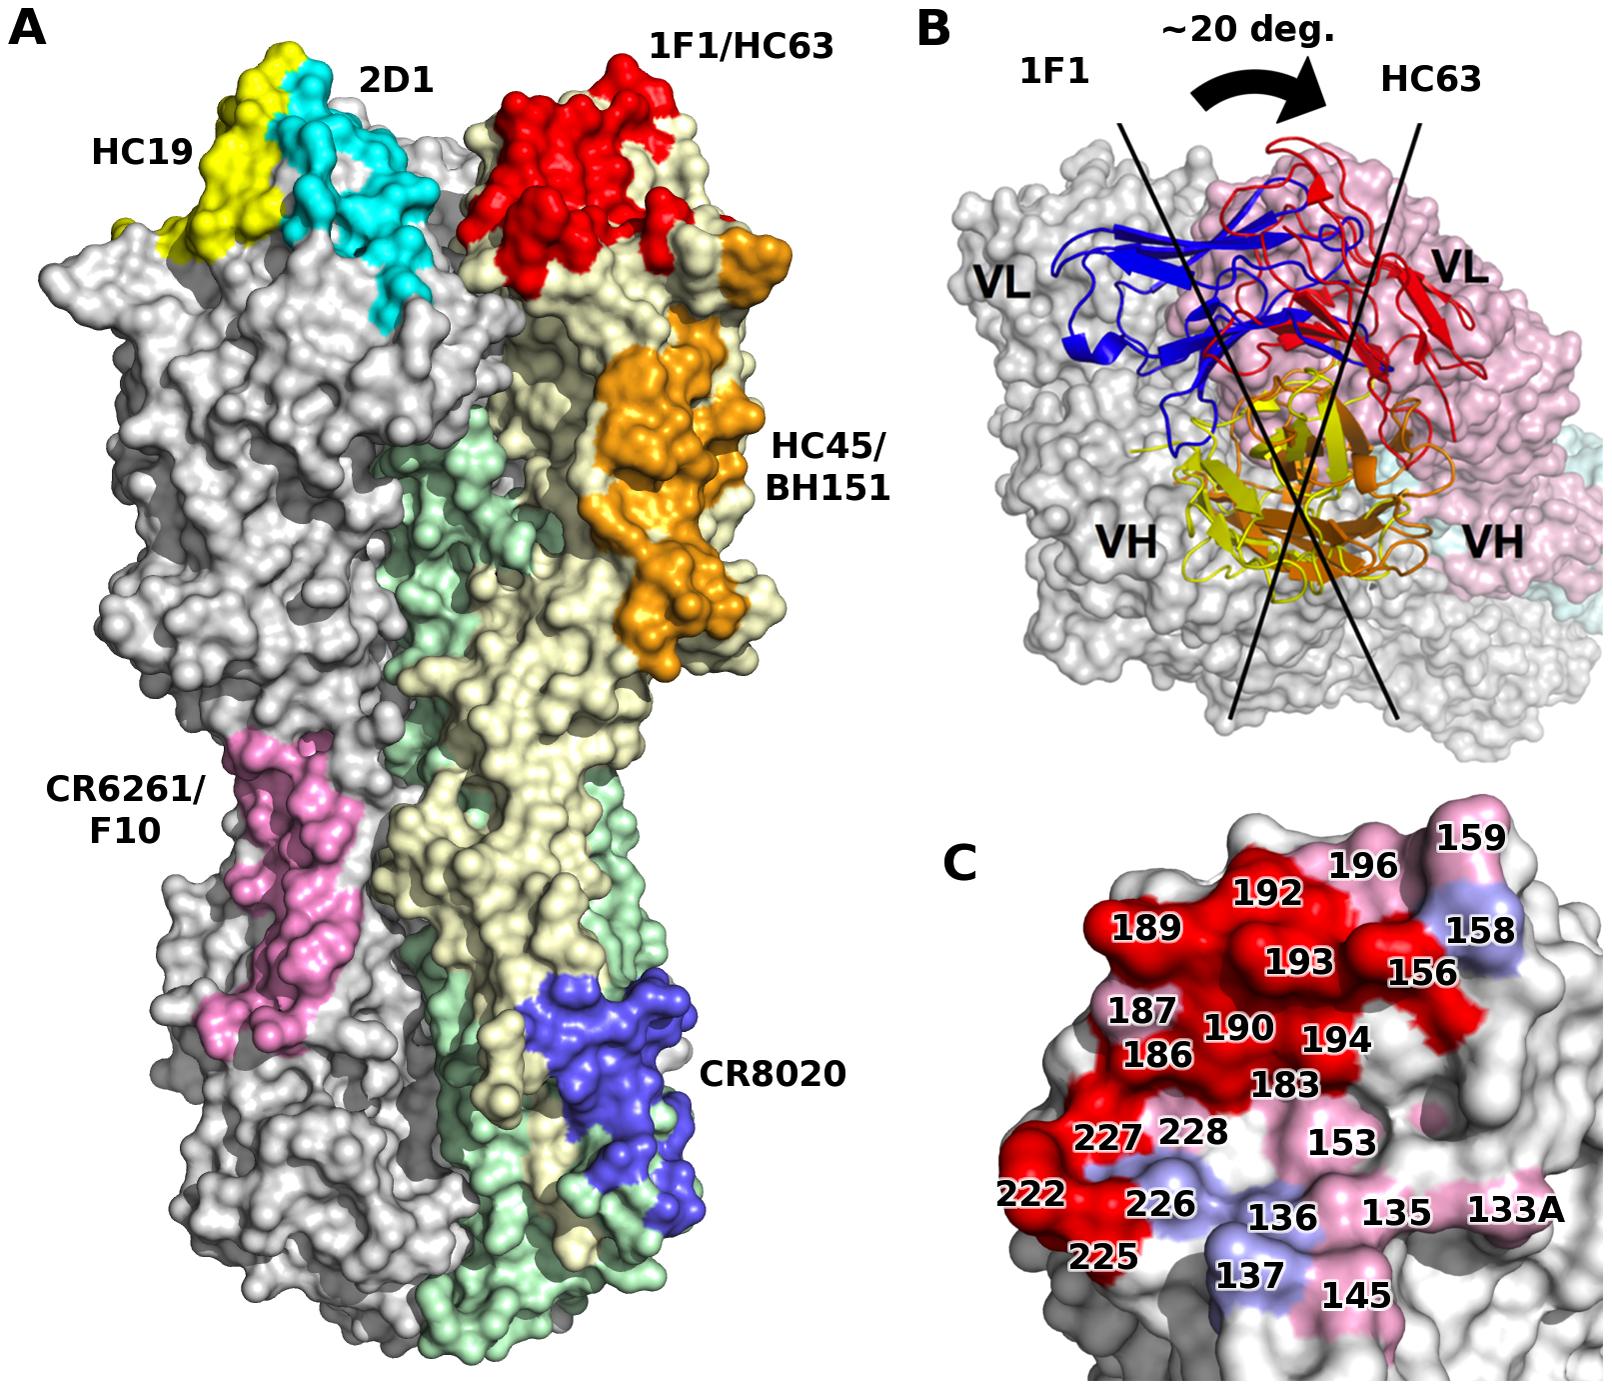 1F1 and HC63 exhibit similar HA binding modes.